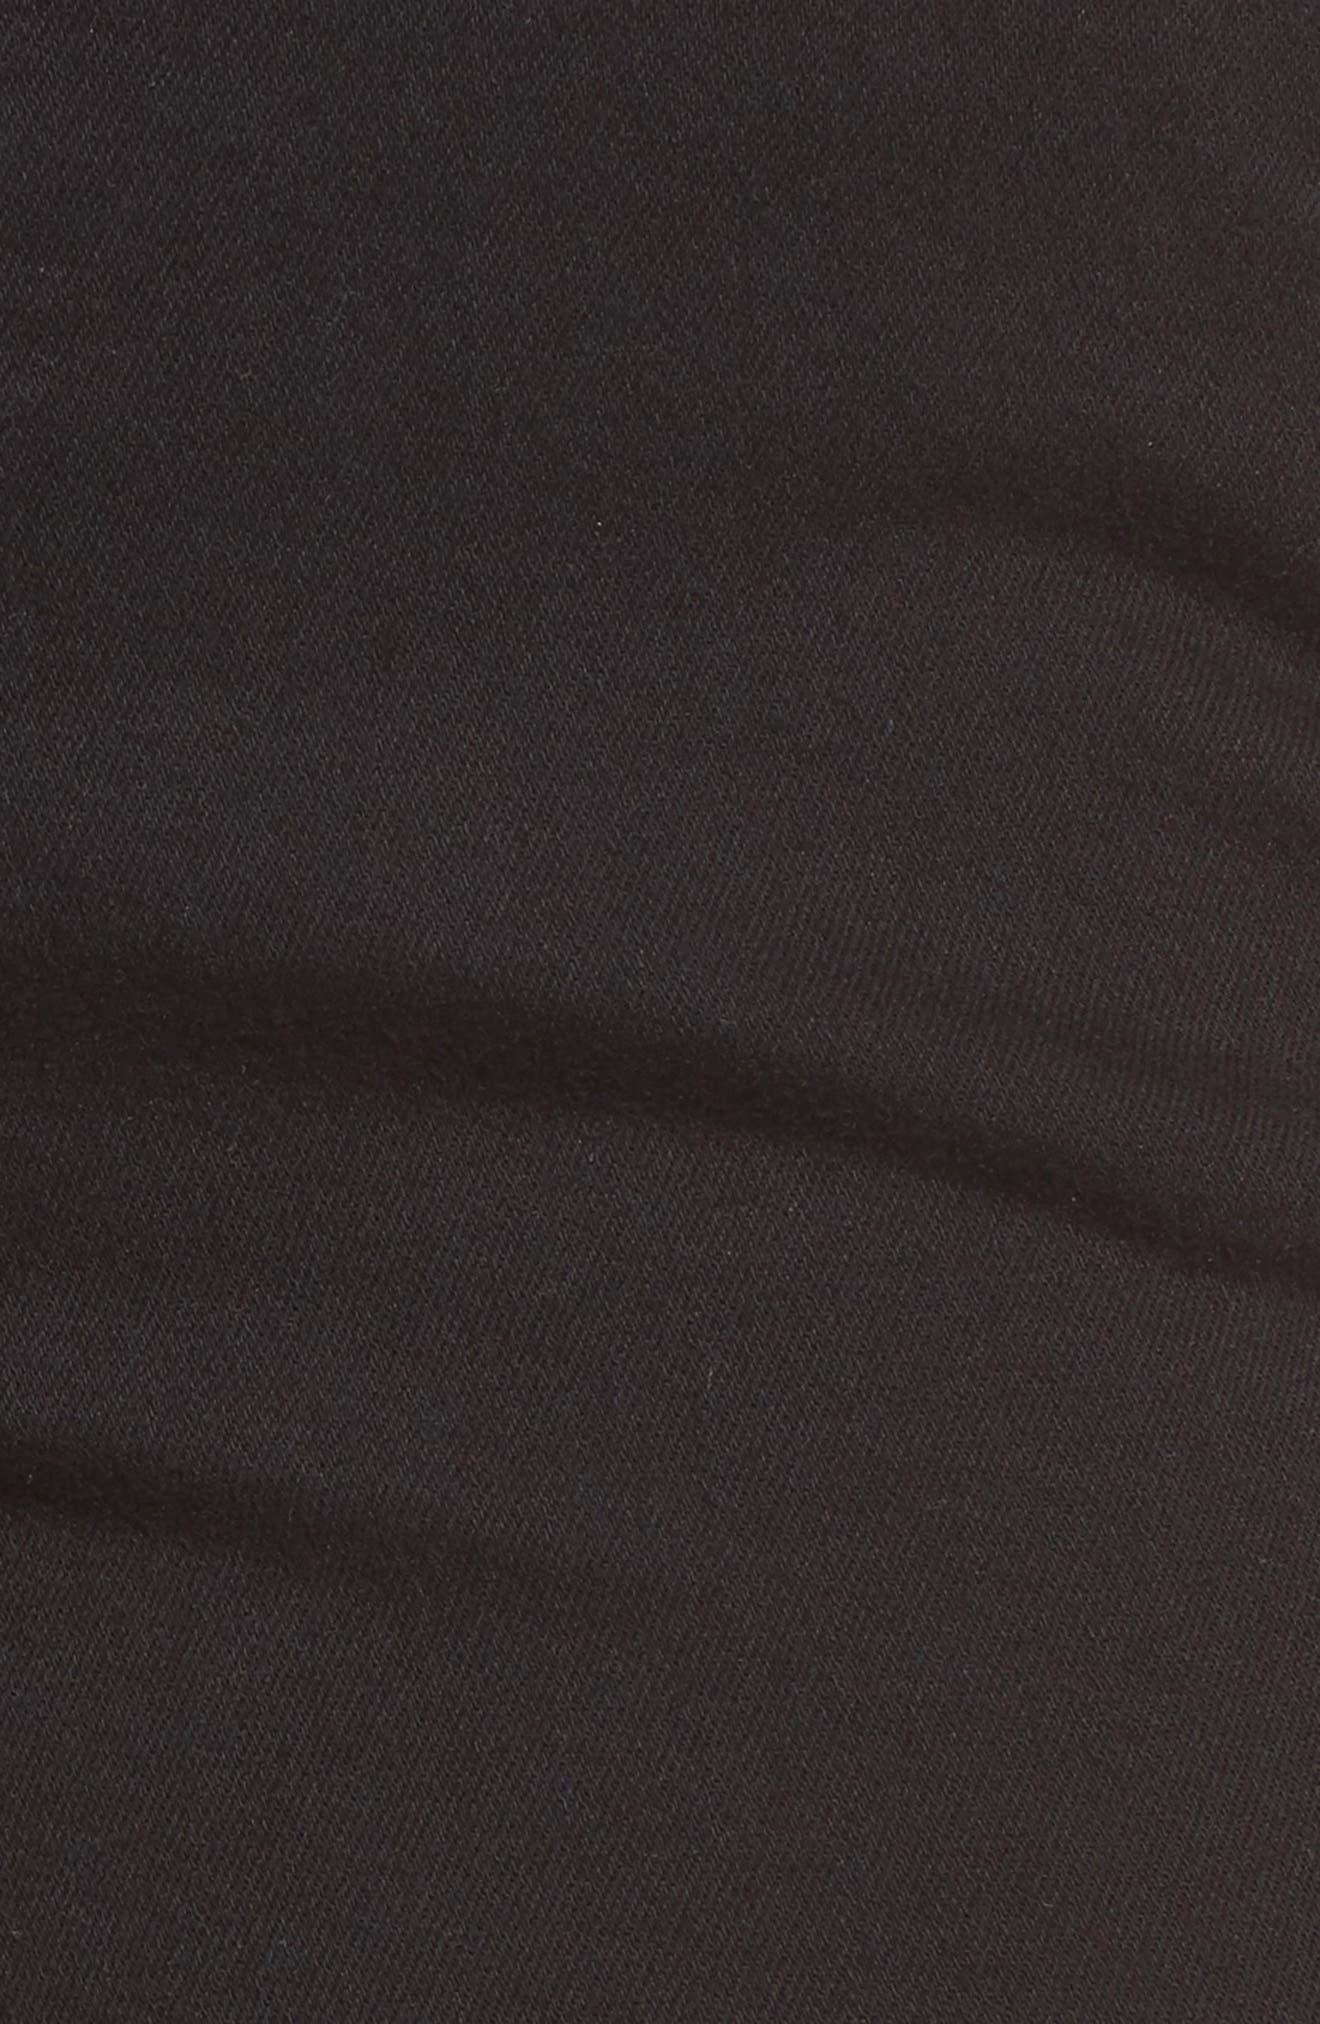 Juliette Skinny Cargo Pants,                             Alternate thumbnail 5, color,                             Black Twill